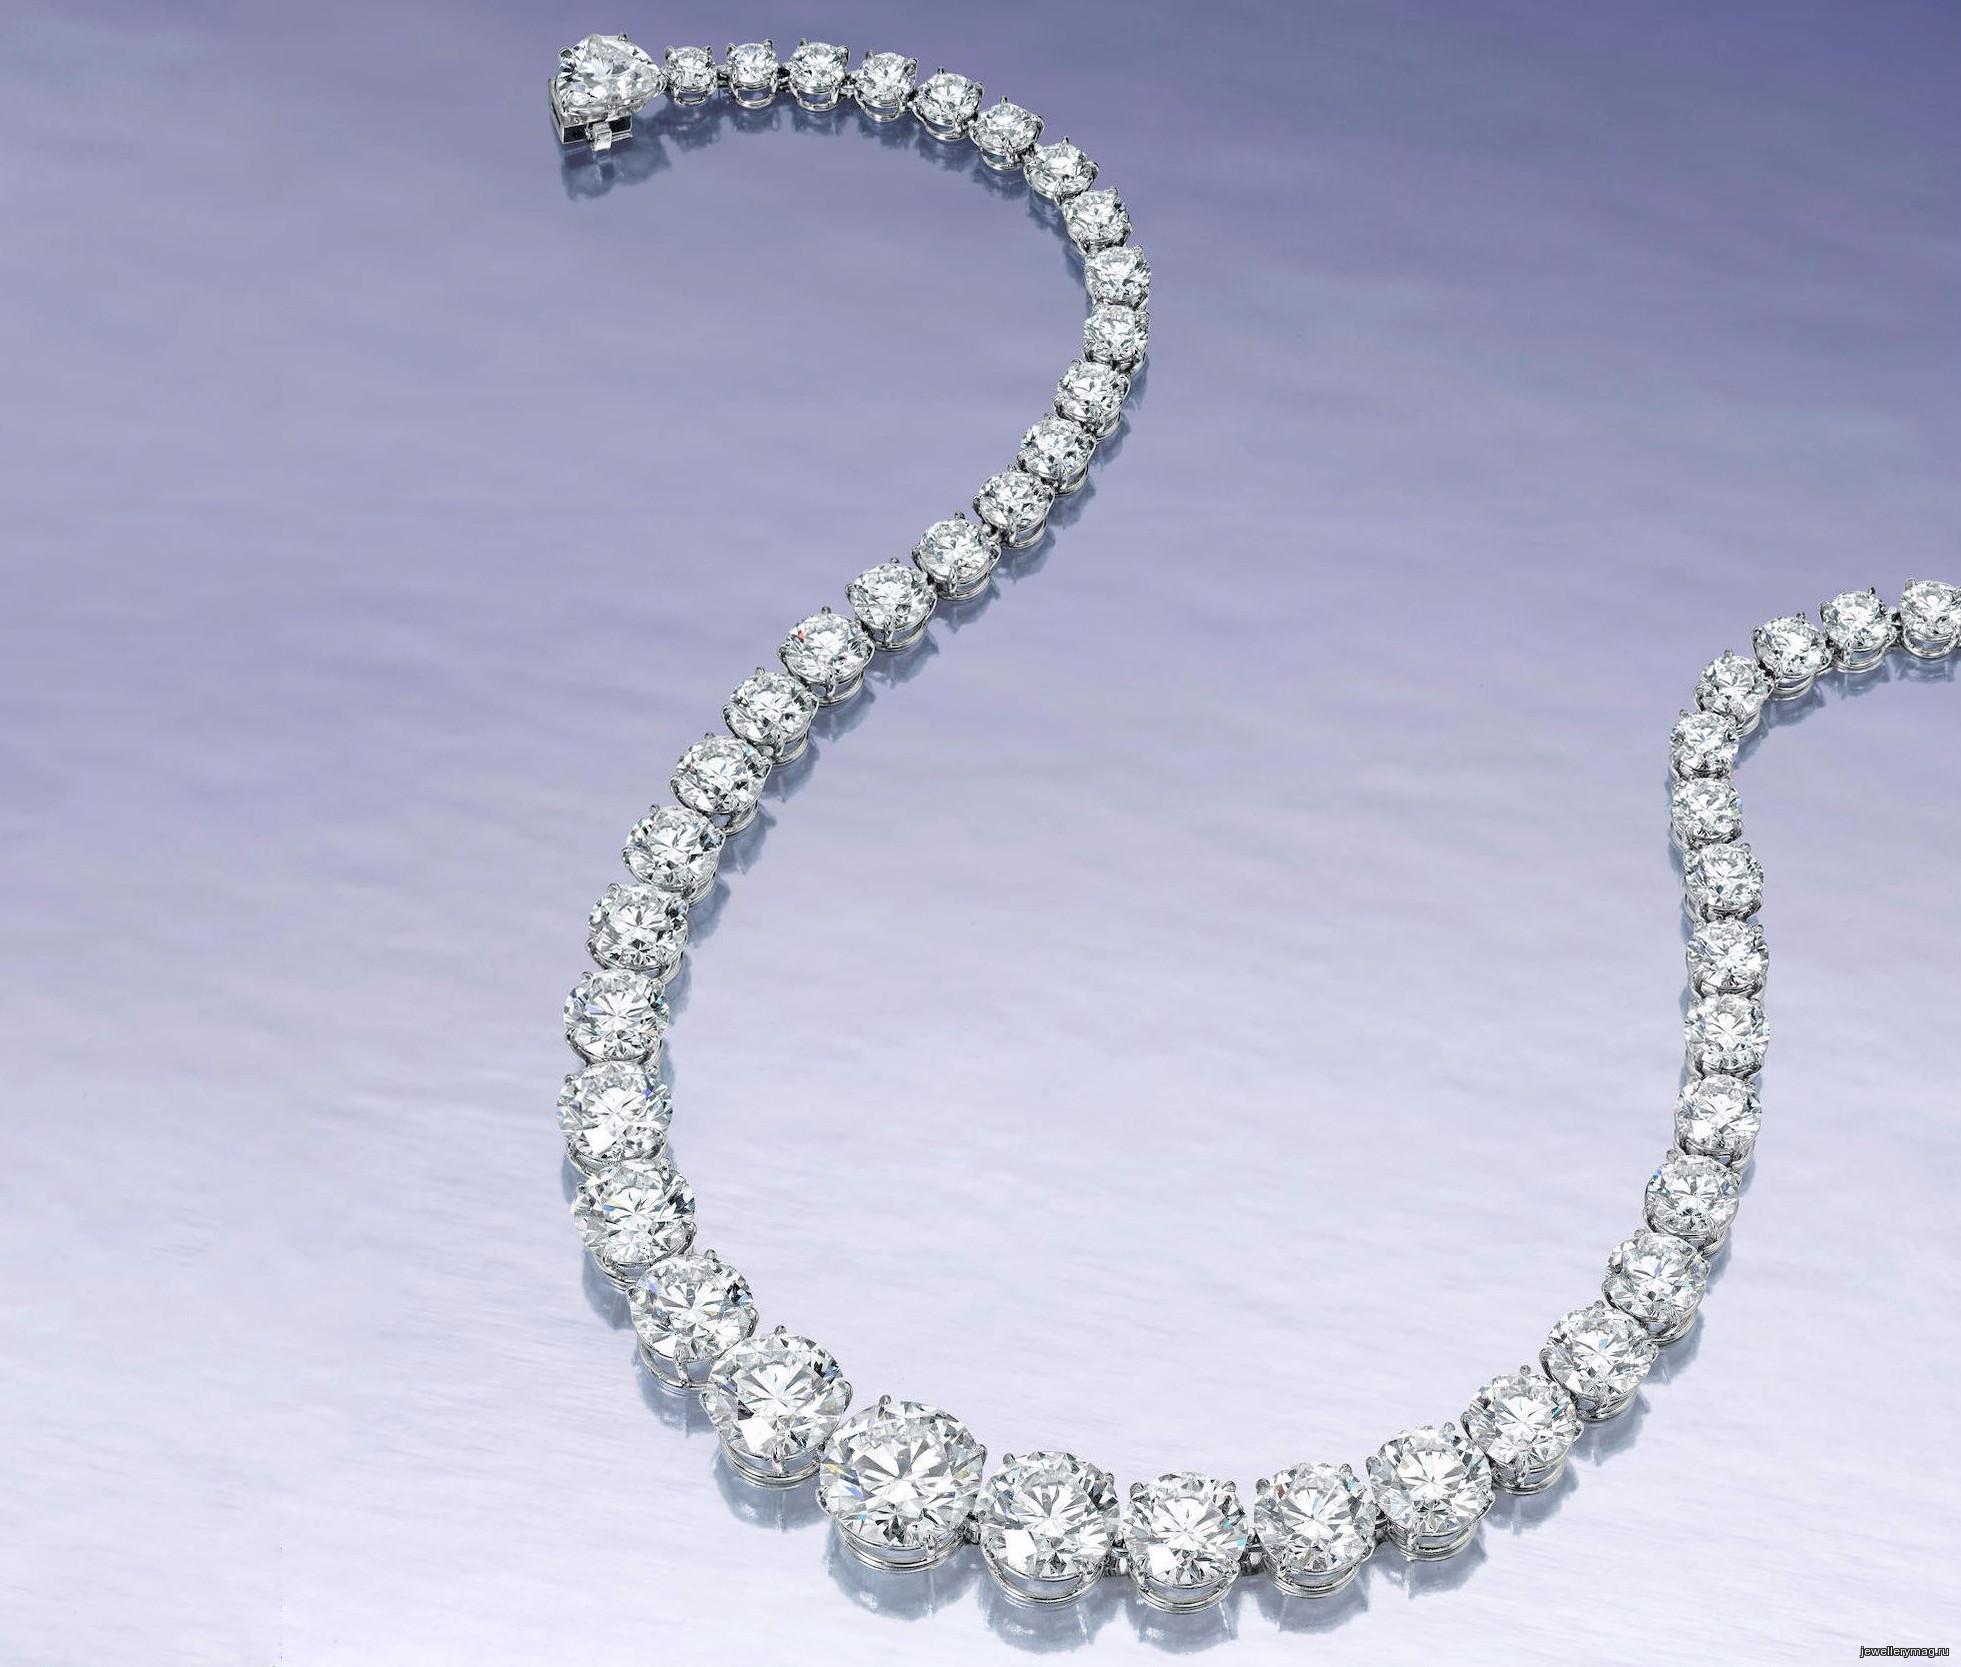 Бриллиантовое колье Triple X продано за 1,2 миллиона долларов